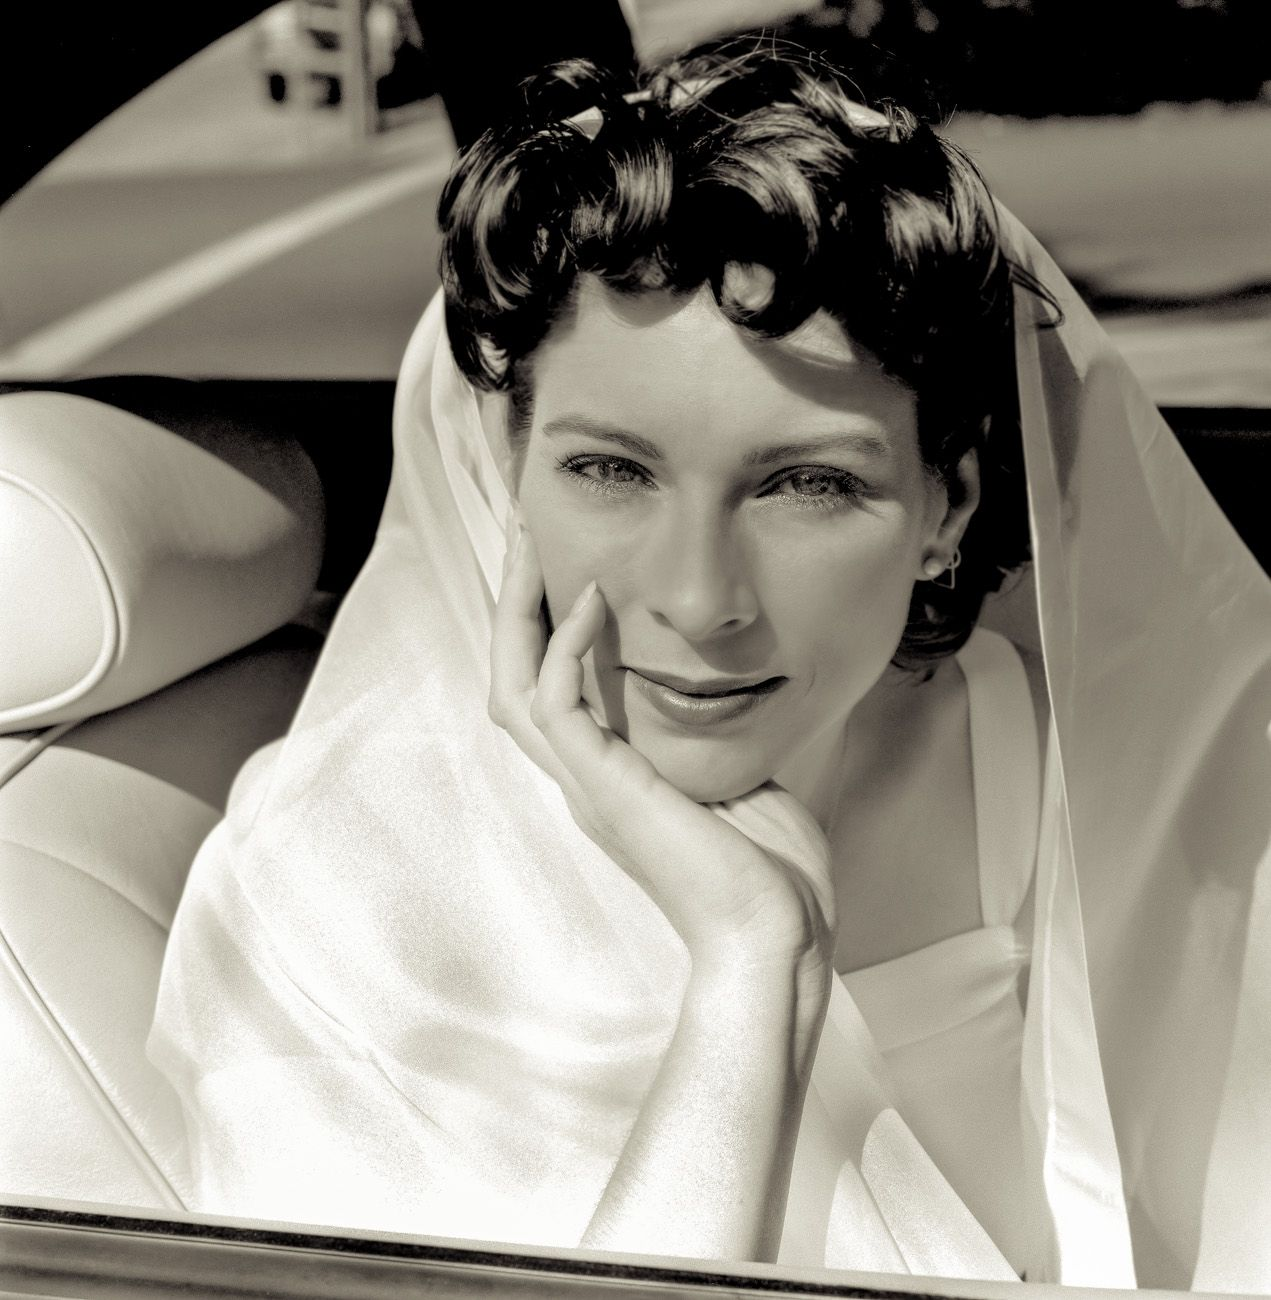 Amanda the Bride